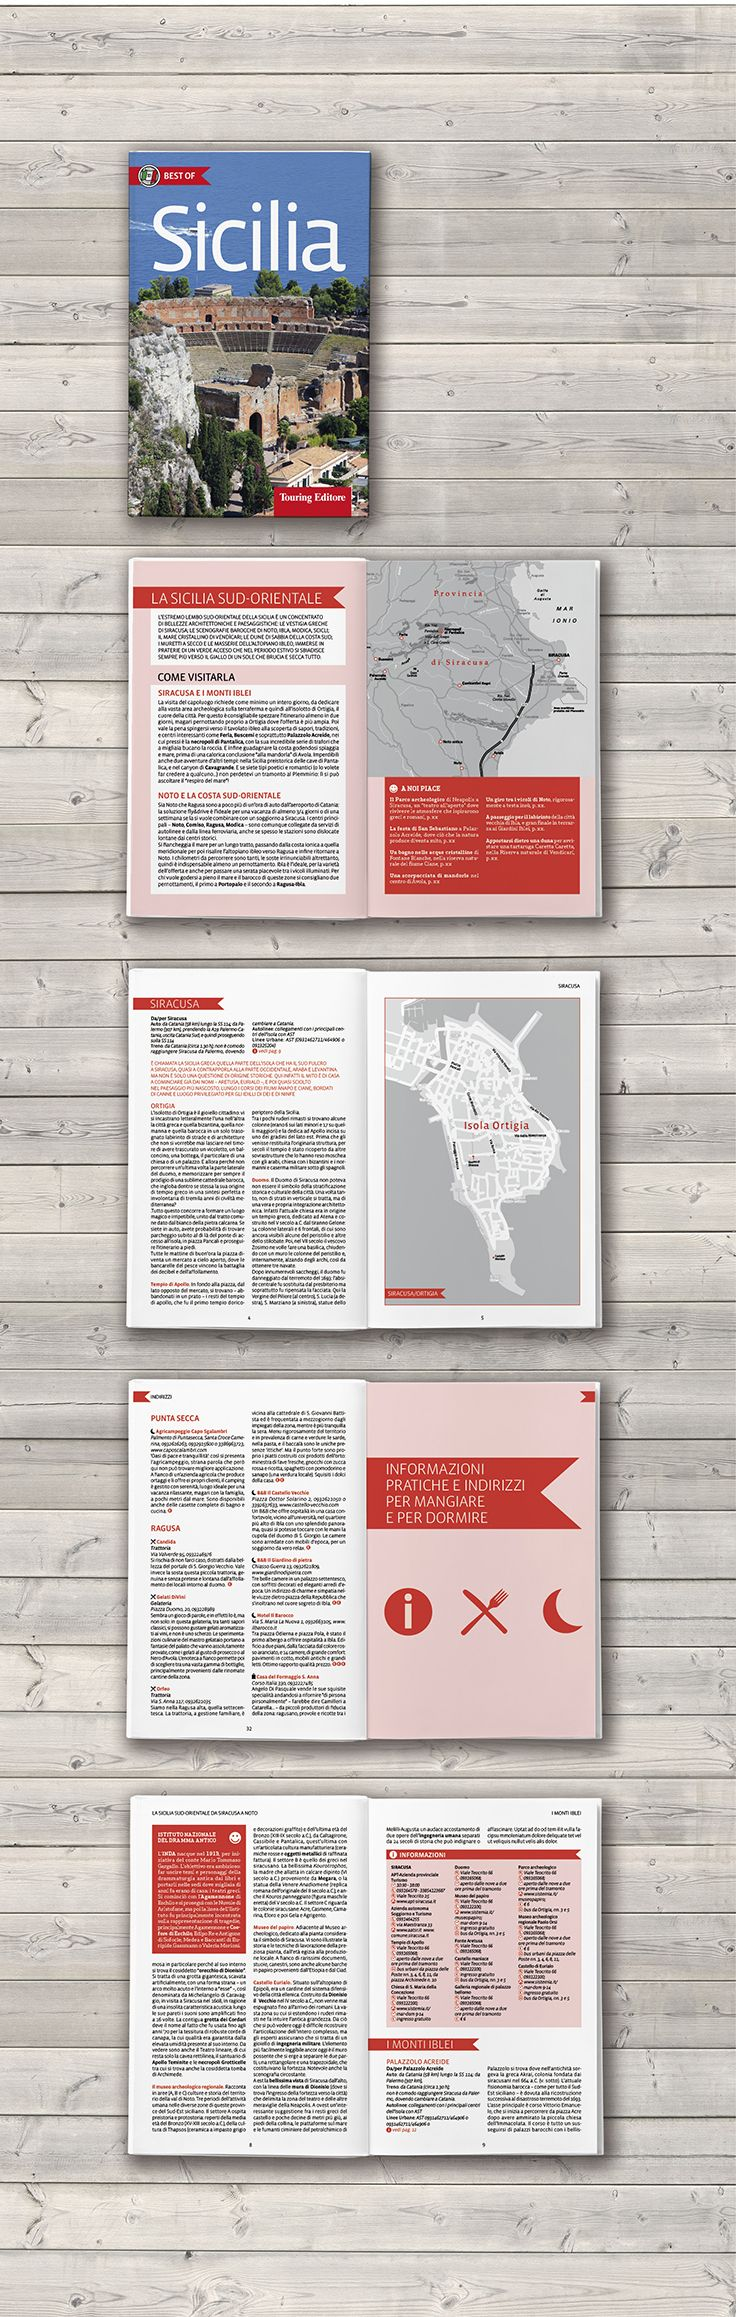 Cover and book design / Tourist guide / Touring Editore